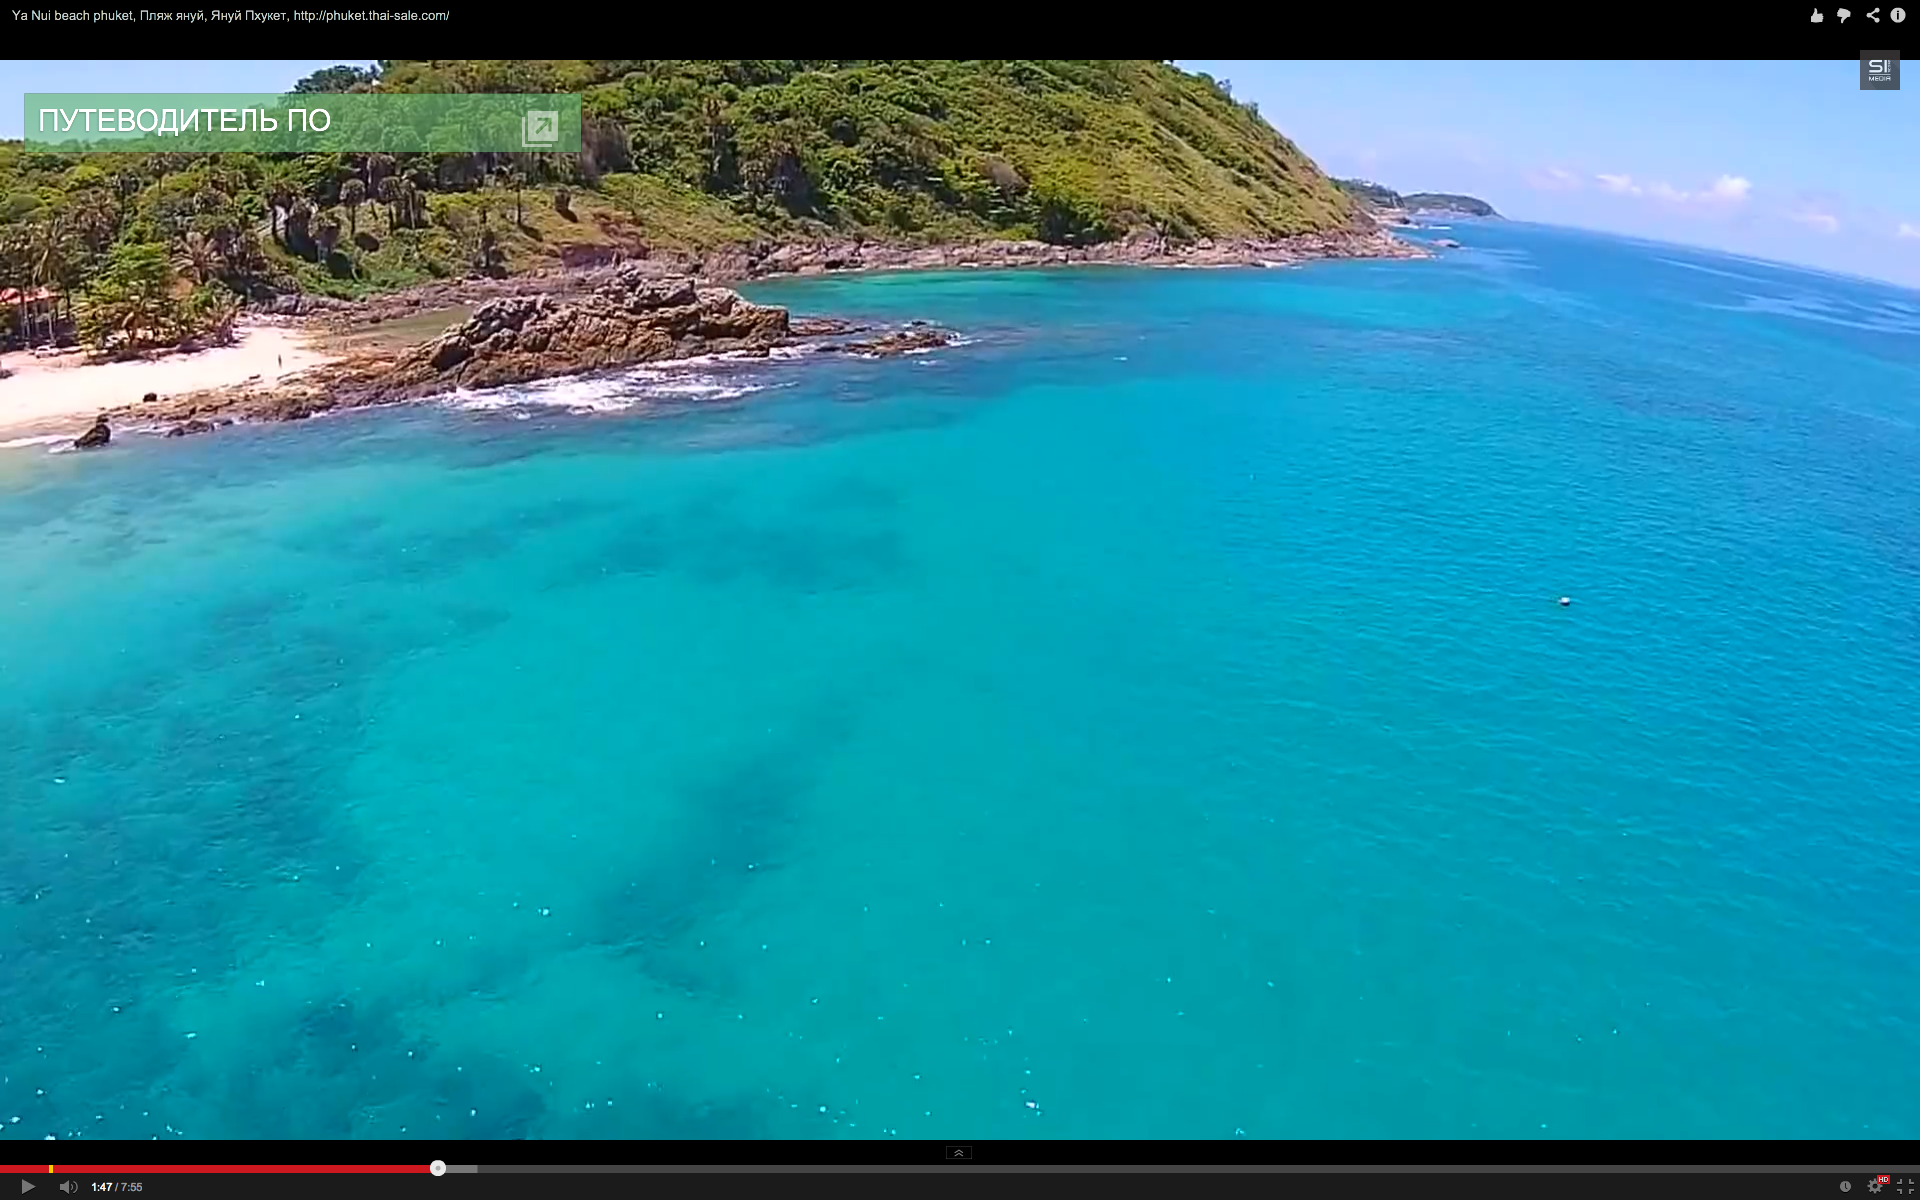 Видео Ya Nui beach phuket, Пляж Януй, Януй Пхукет